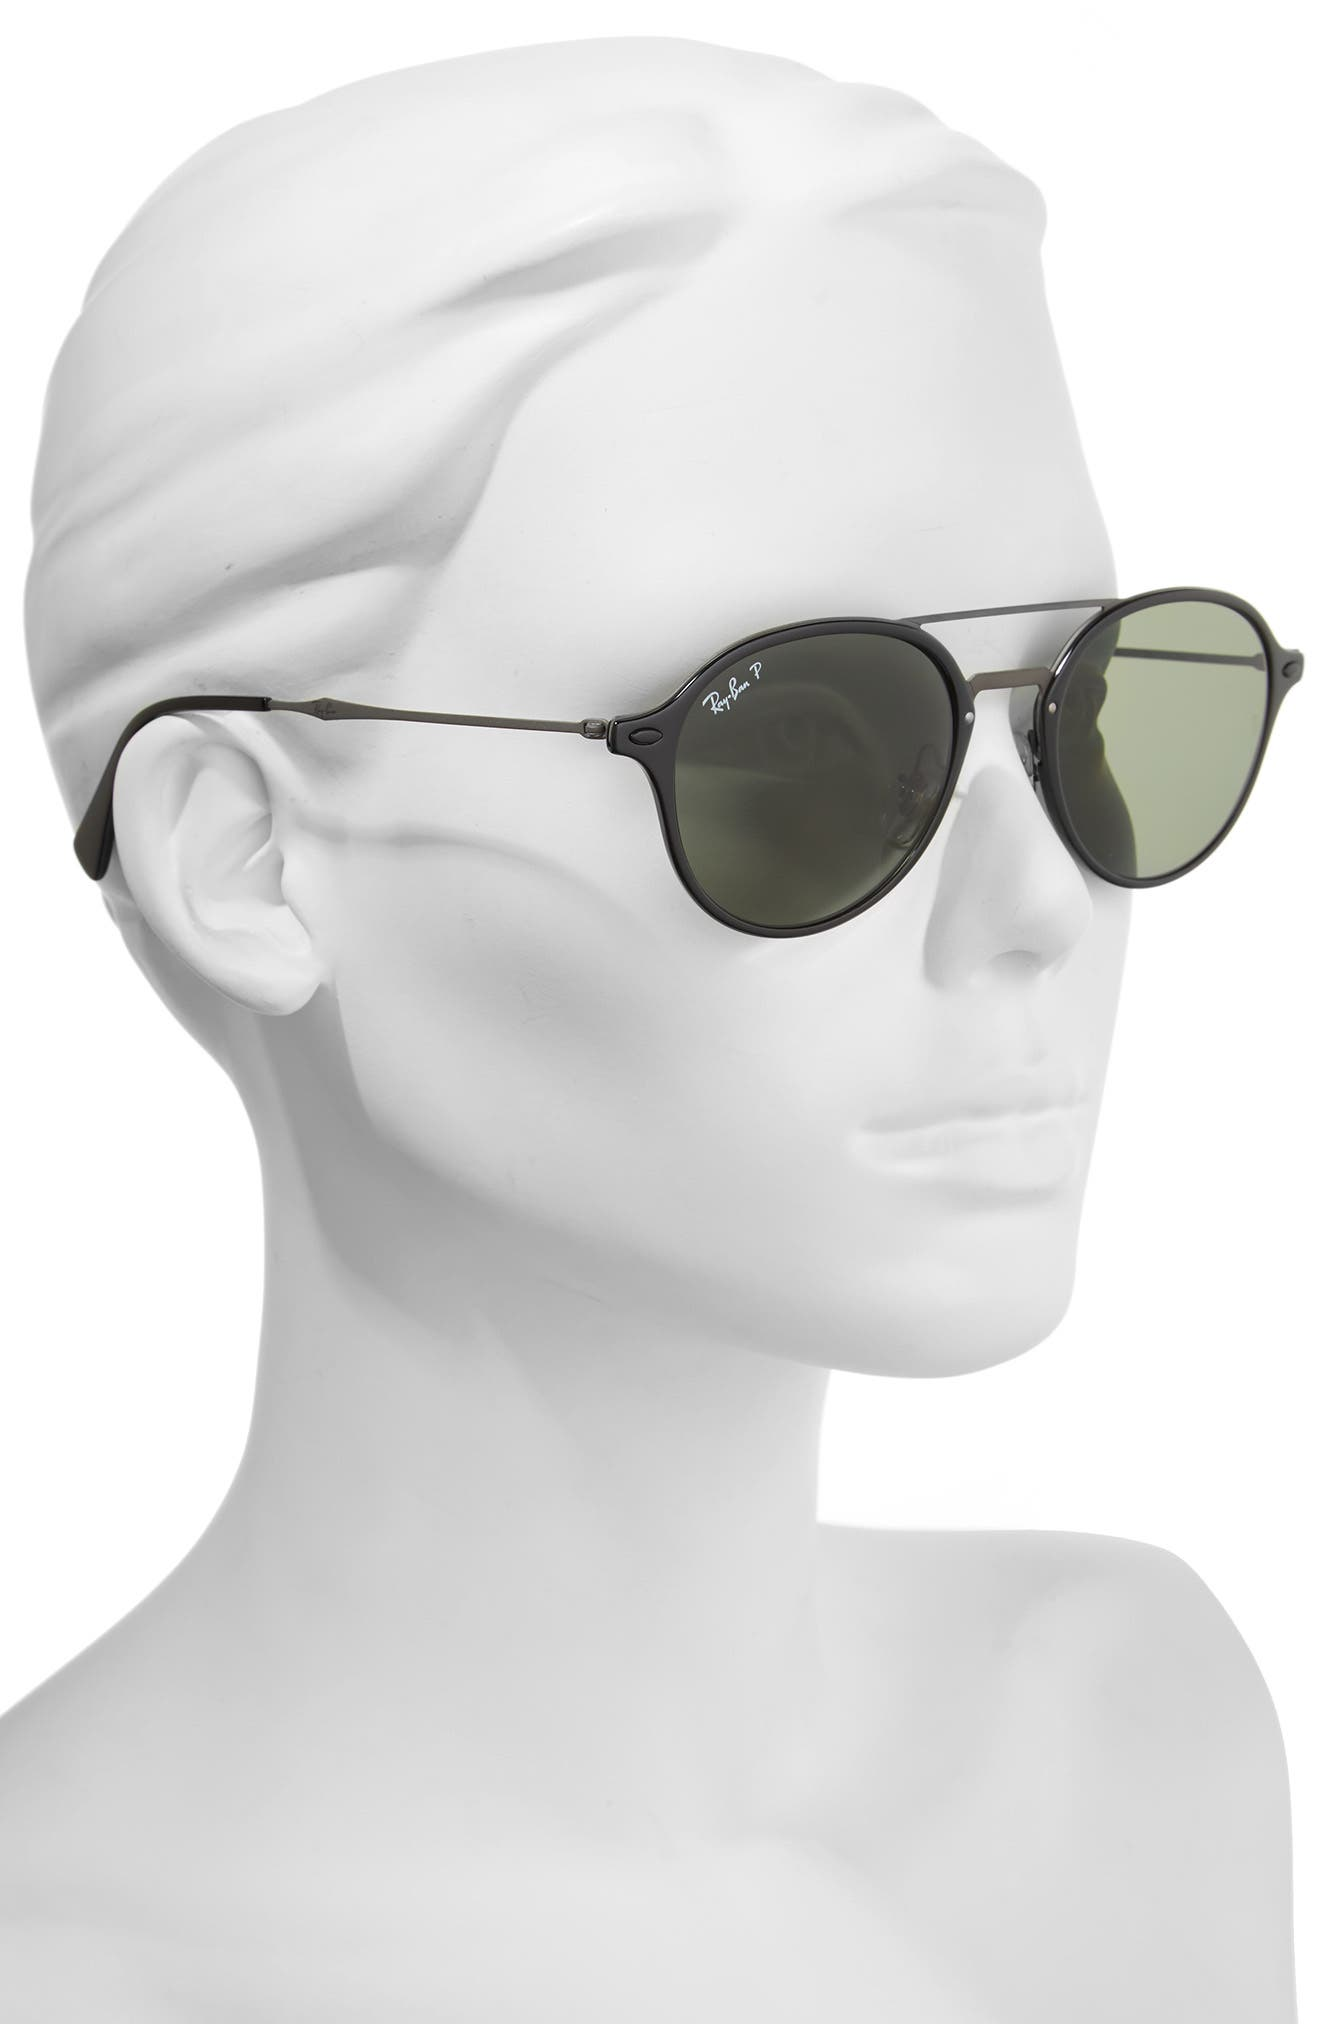 55mm Aviator Sunglasses,                             Alternate thumbnail 2, color,                             001